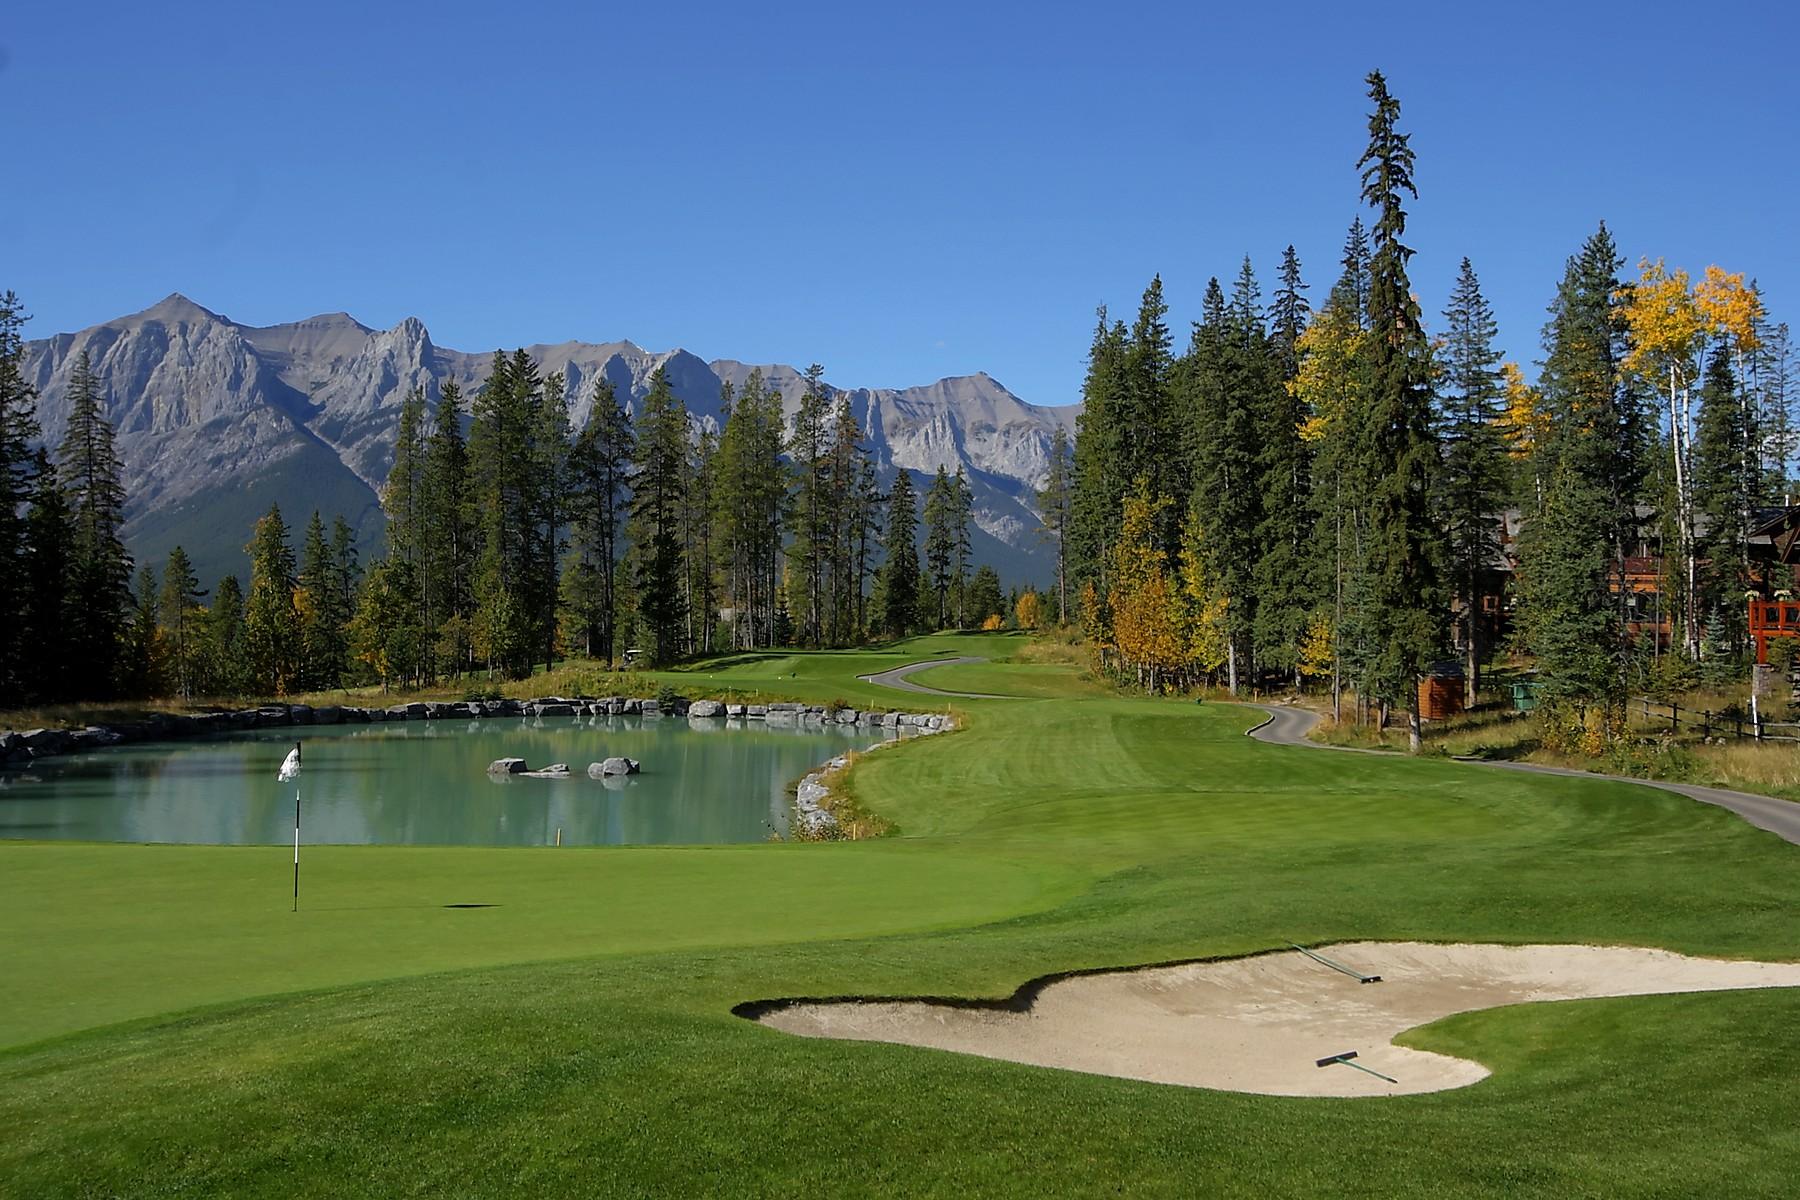 Земля для того Продажа на Silvertip Golf Course Lot 549 Silvertip Road, Canmore, Альберта, T1W 3H3 Канада